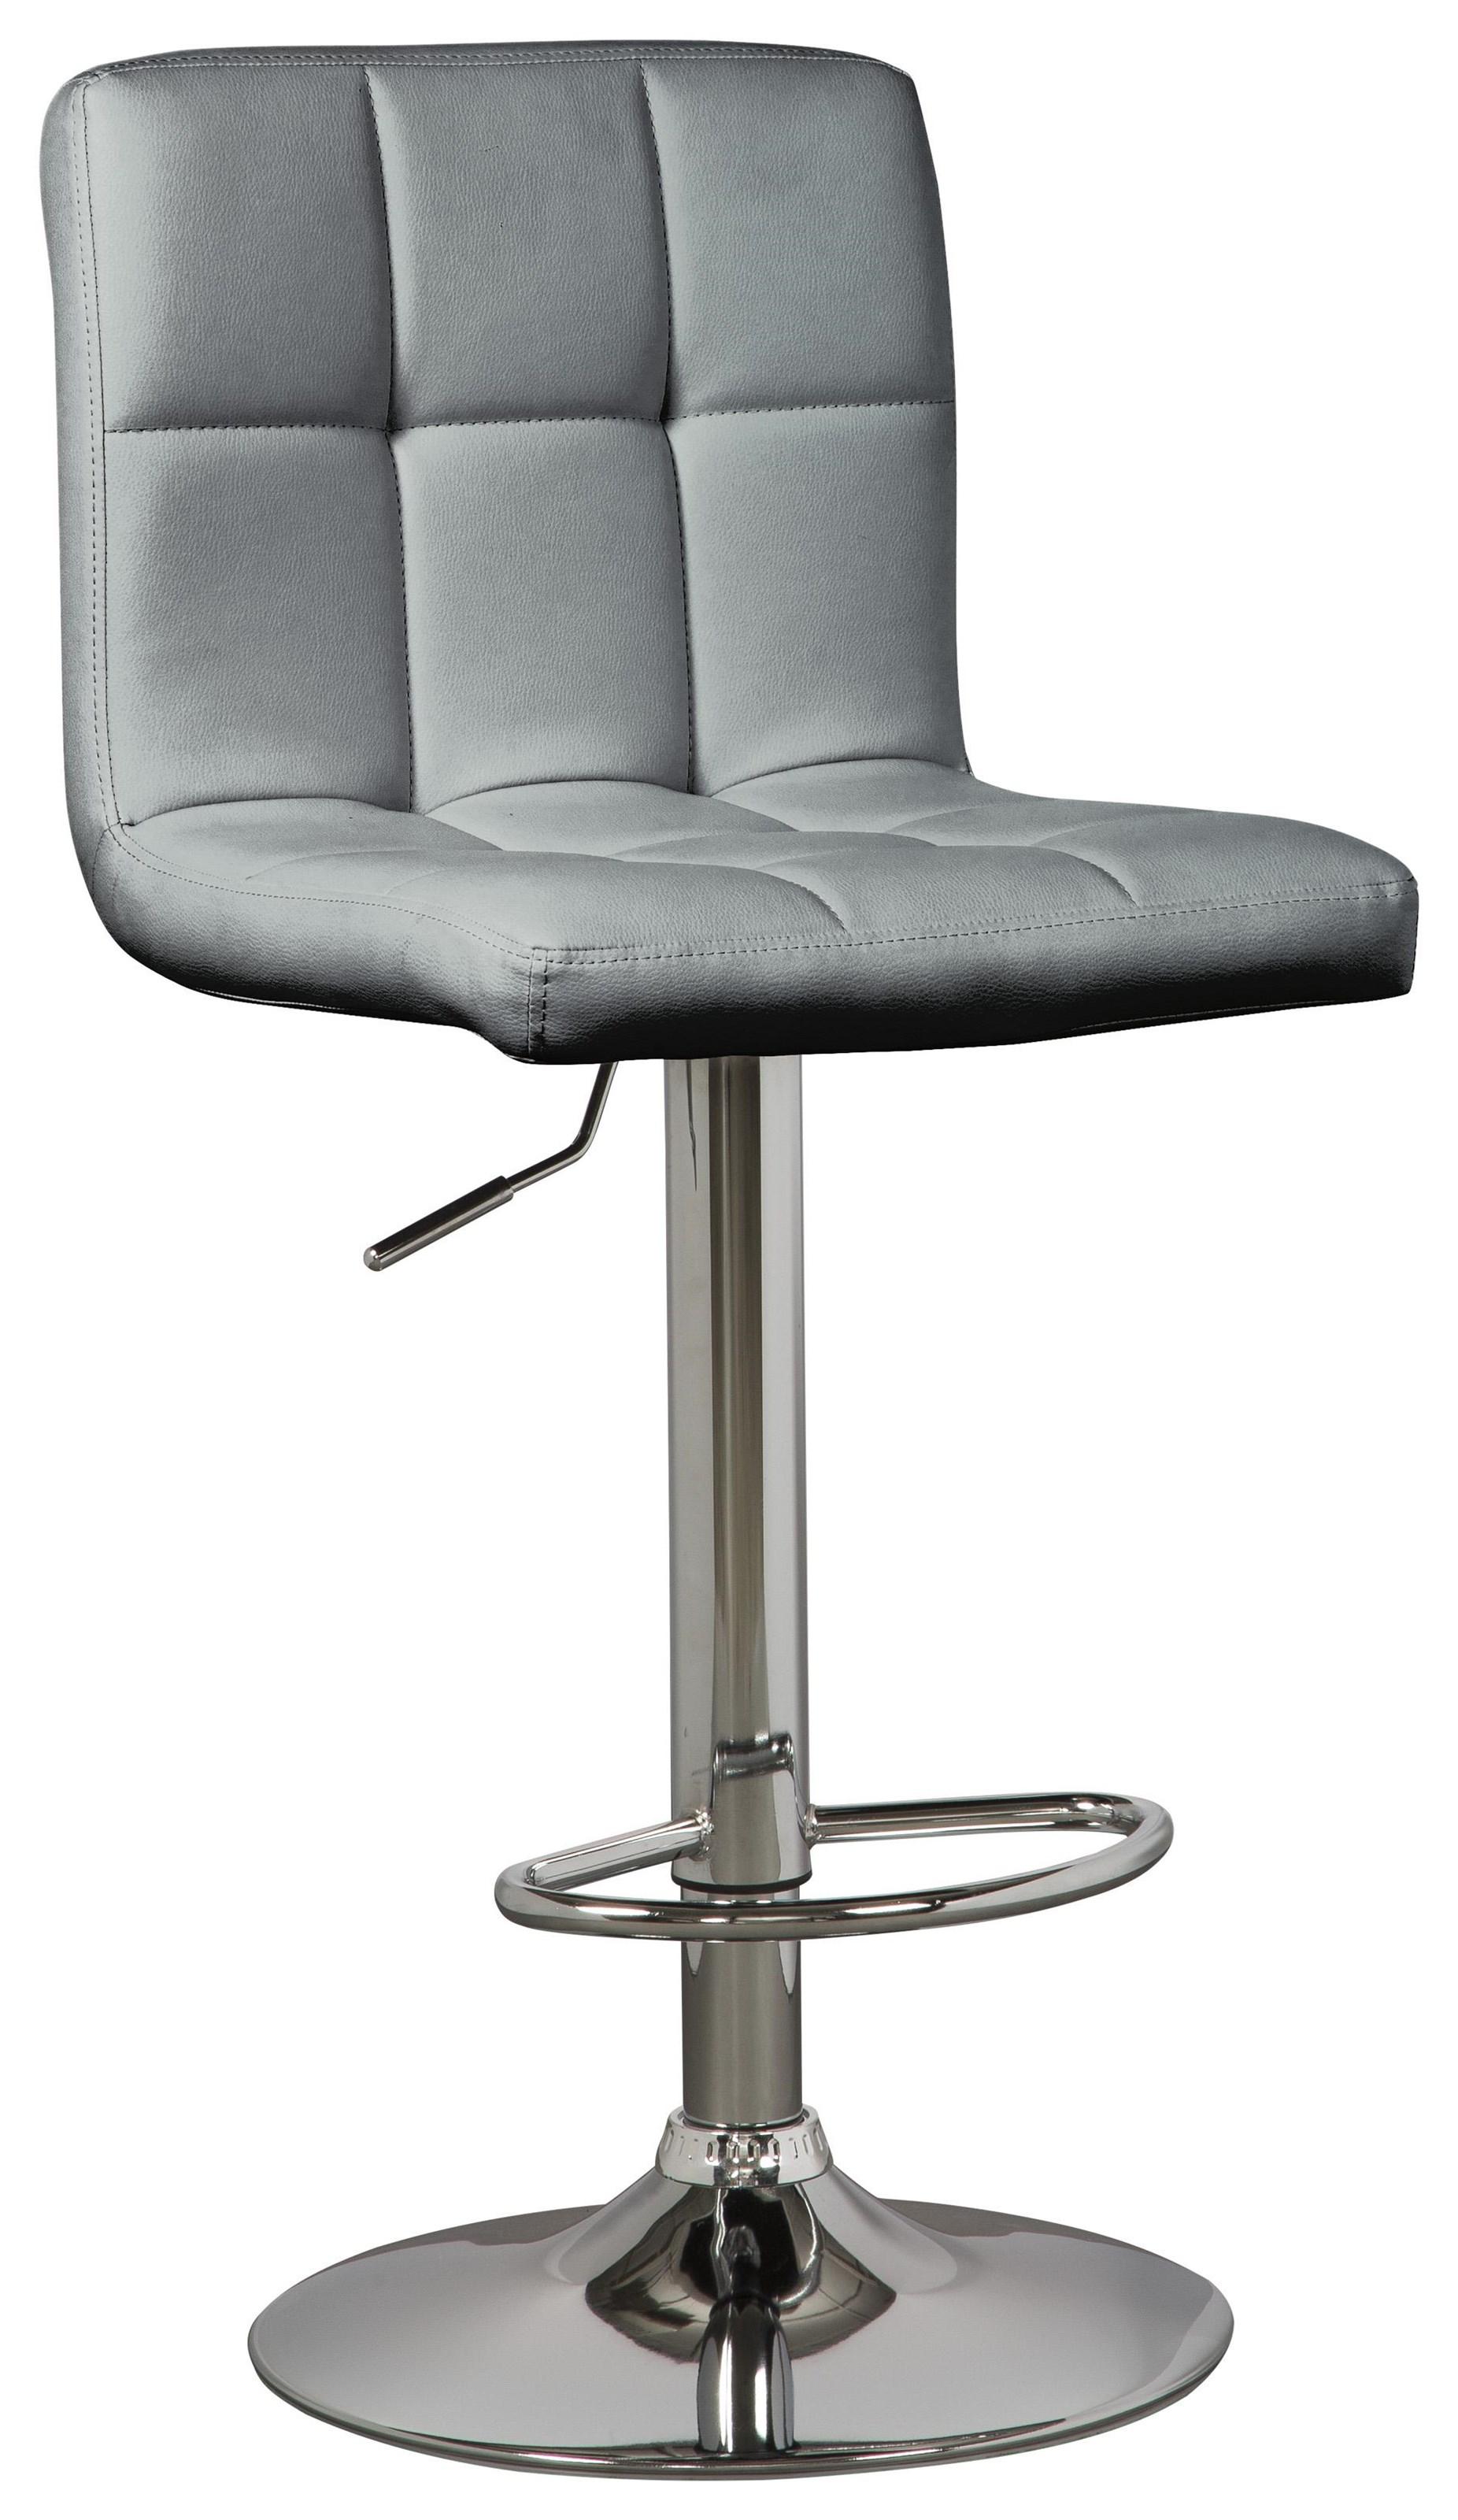 Bellatier Adjustable Bar Height Upholstered Swivel Bar by Signature Design by Ashley at Sam Levitz Furniture